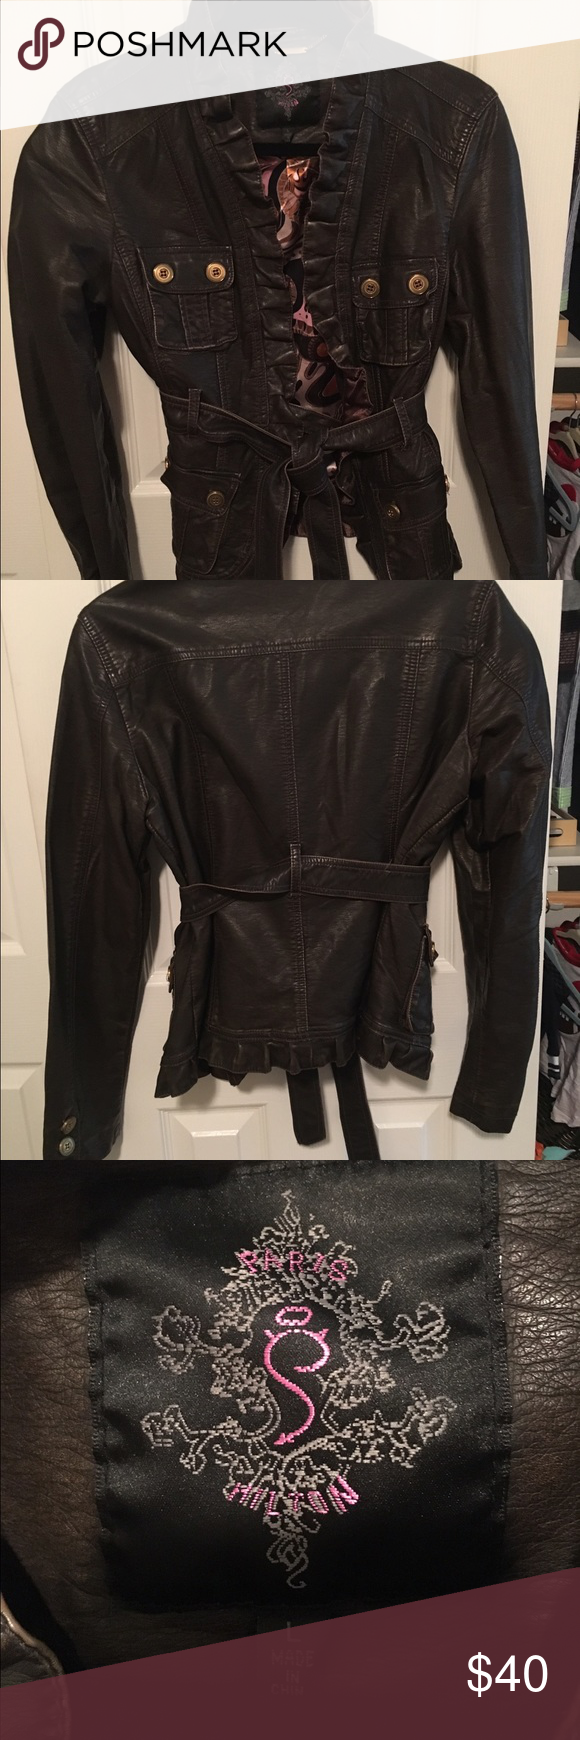 Paris Hilton ruffled edge faux leather jacket EUC  worn once. Very cute fit! Love the ruffle edge! Jackets & Coats Blazers